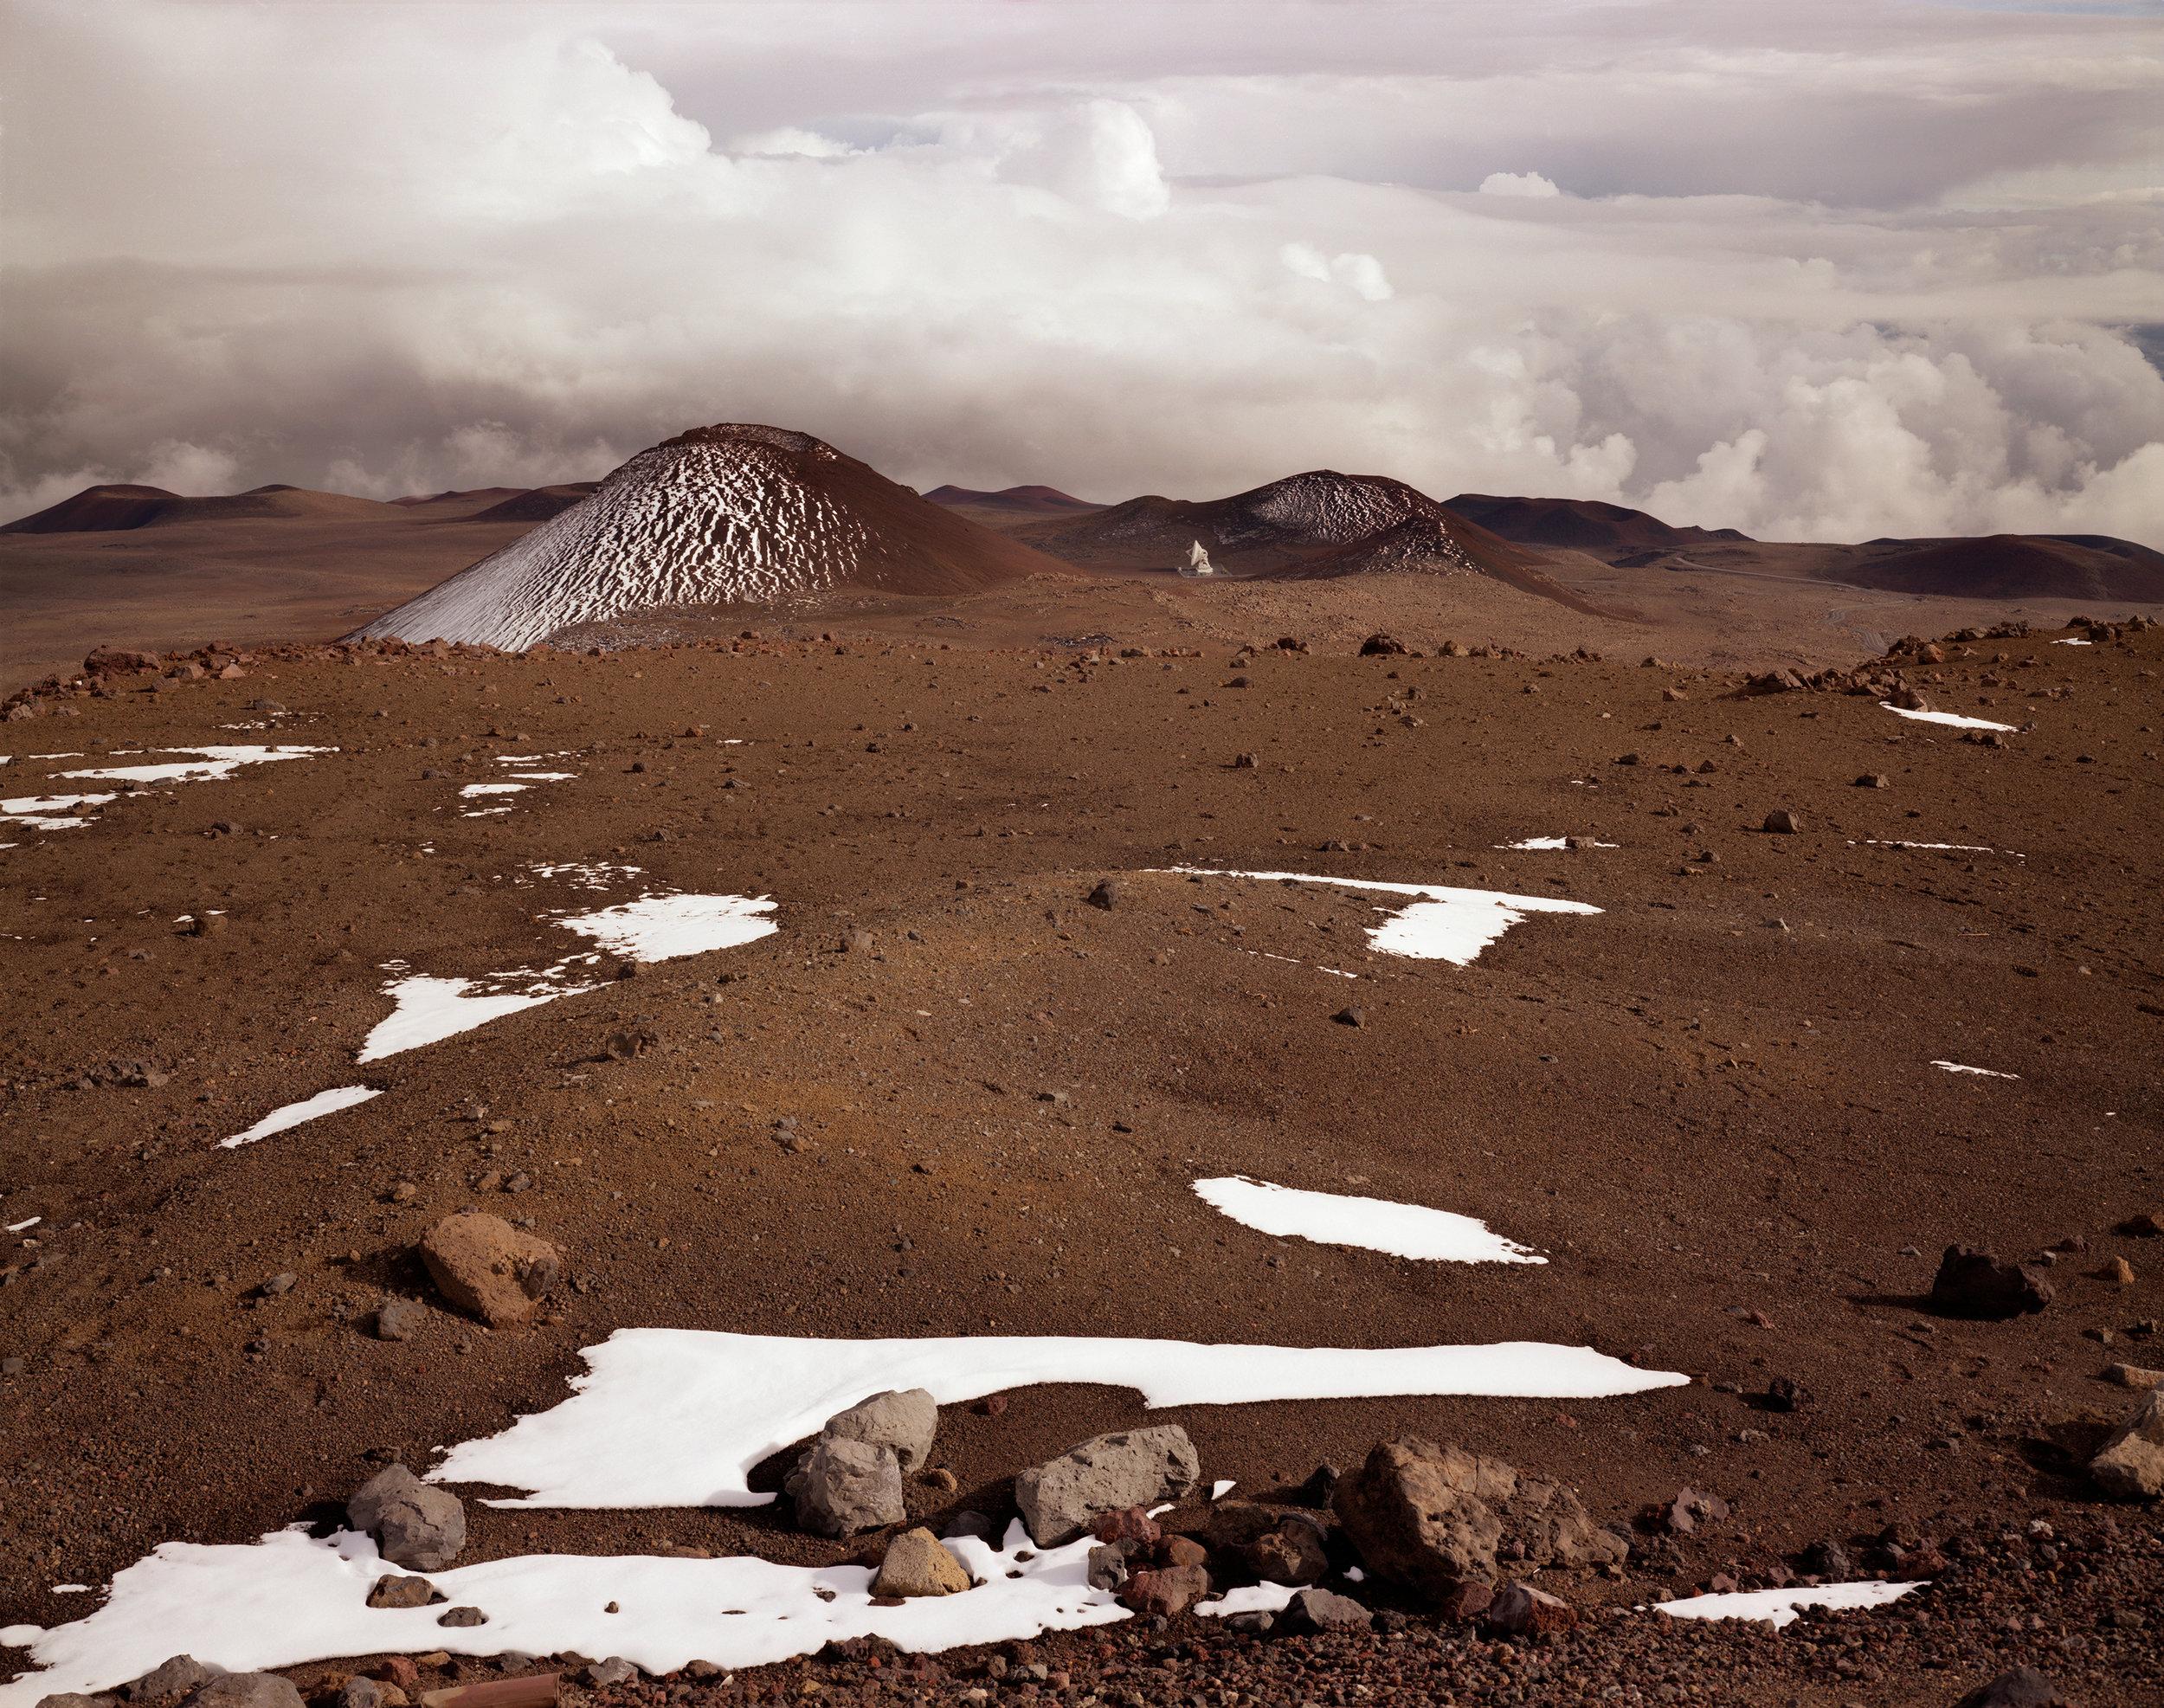 Satellite dish near the summit of Mauna Kea, Hamakua, Hawai'i, 1996